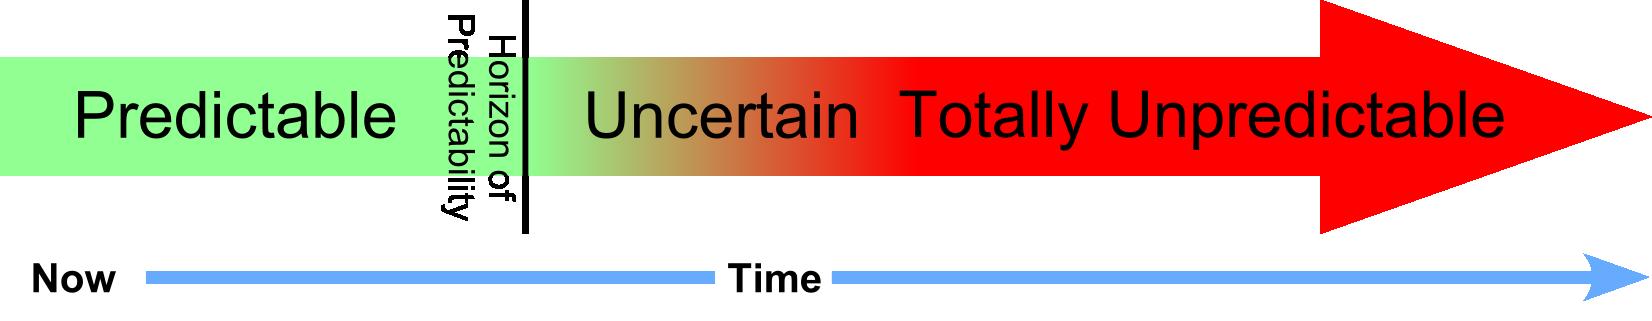 agile-work-horizon-of-predictability